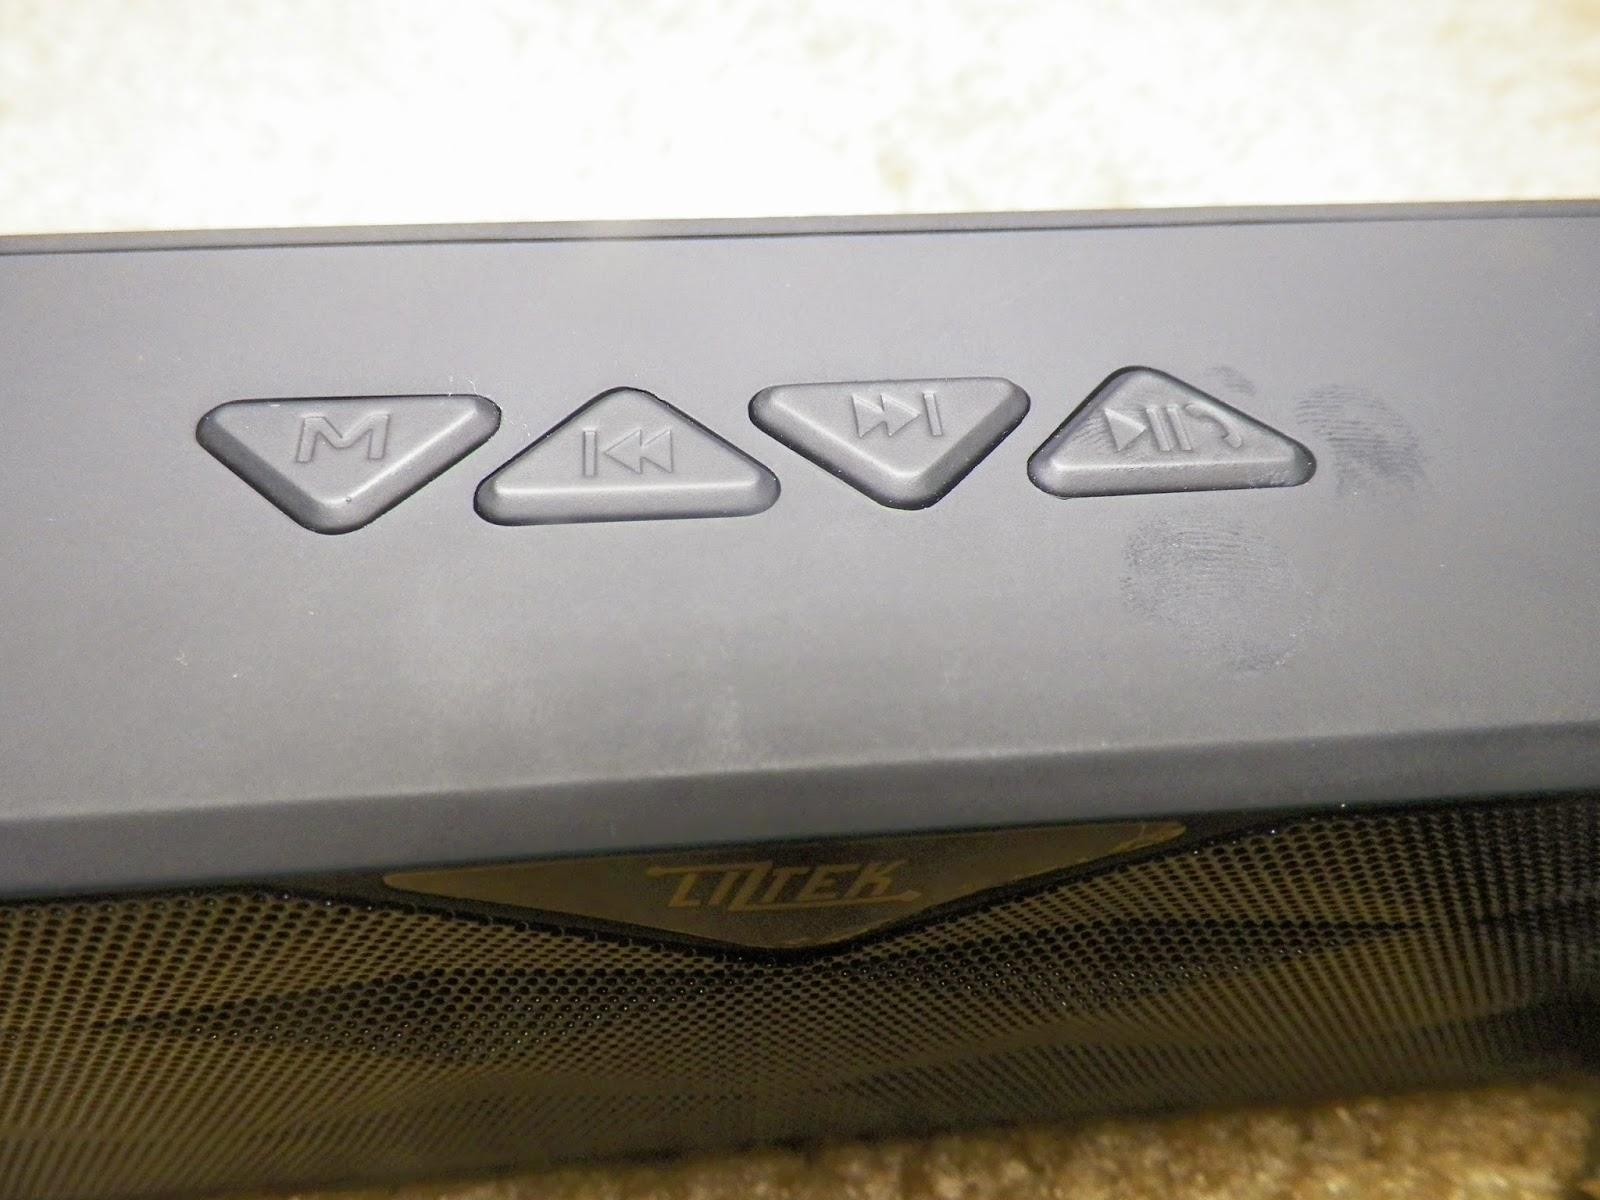 LiztekPSS60BUltraPOrtableBluetoothWirelessSpeaker.jpg